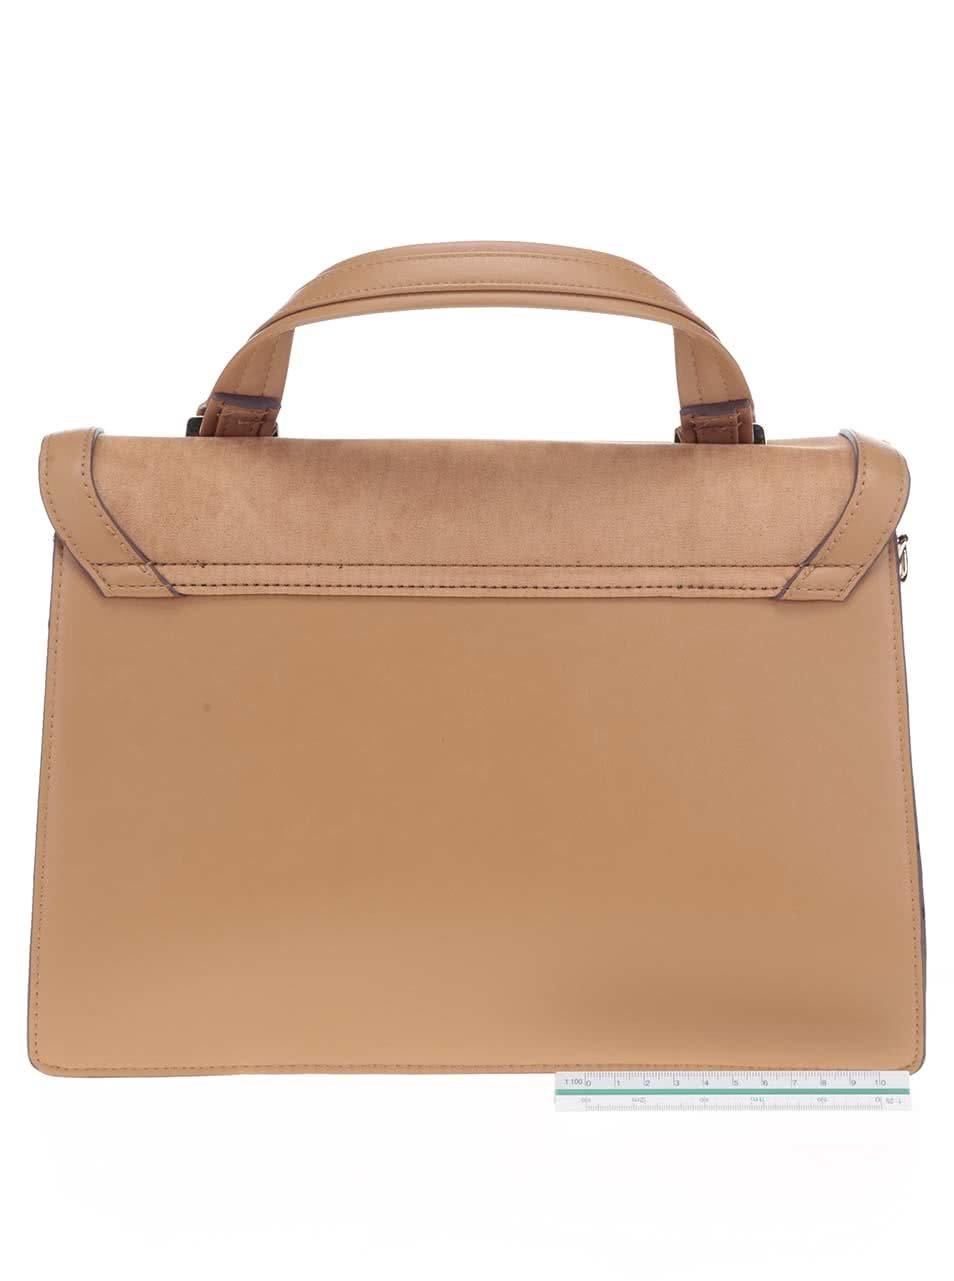 Béžová kabelka s popruhom Dorothy Perkins ... 89da1f0fb33